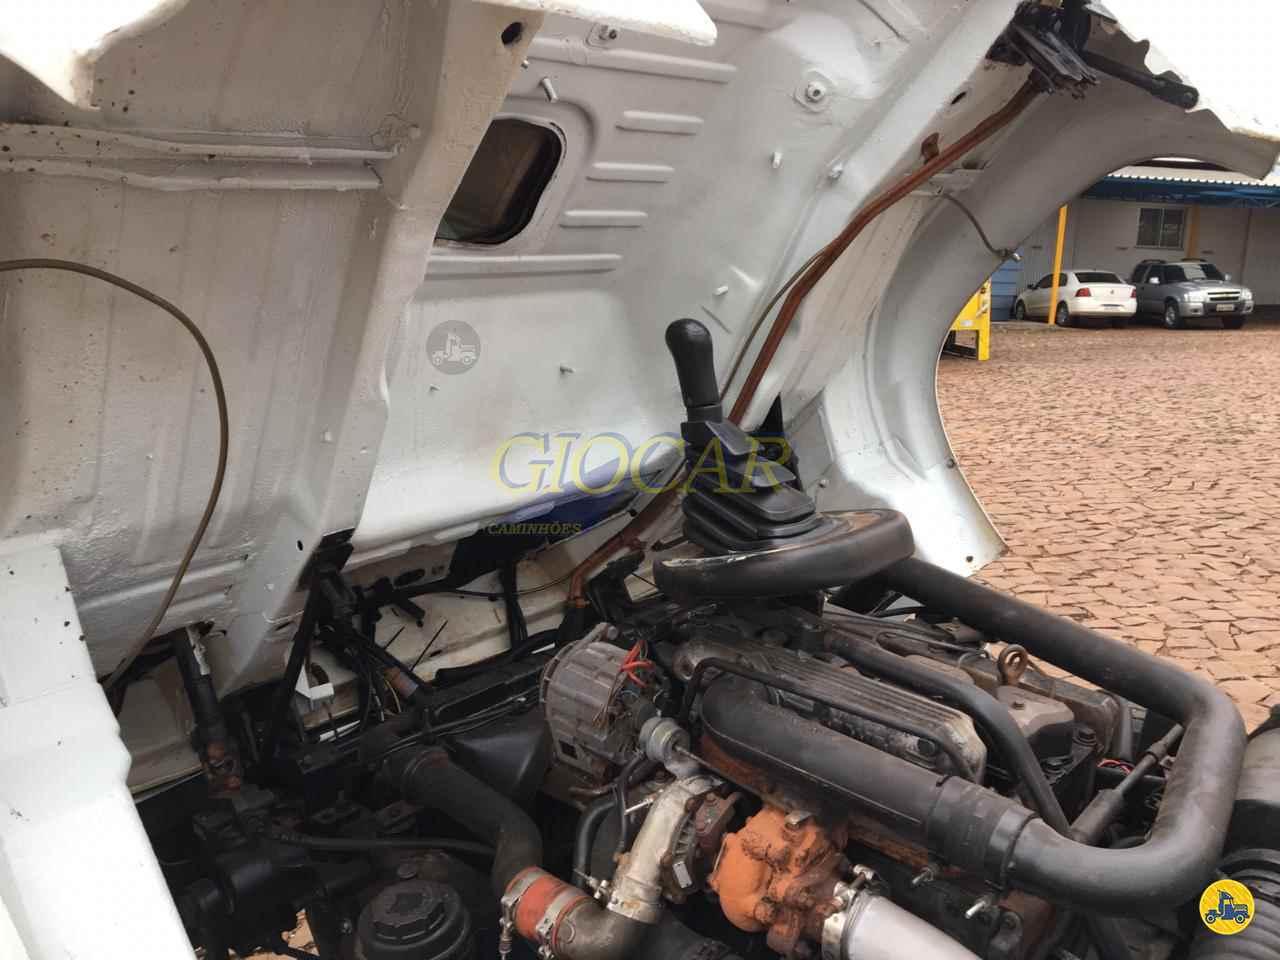 VOLKSWAGEN VW 8120 490000km 2001/2002 Giocar Caminhões